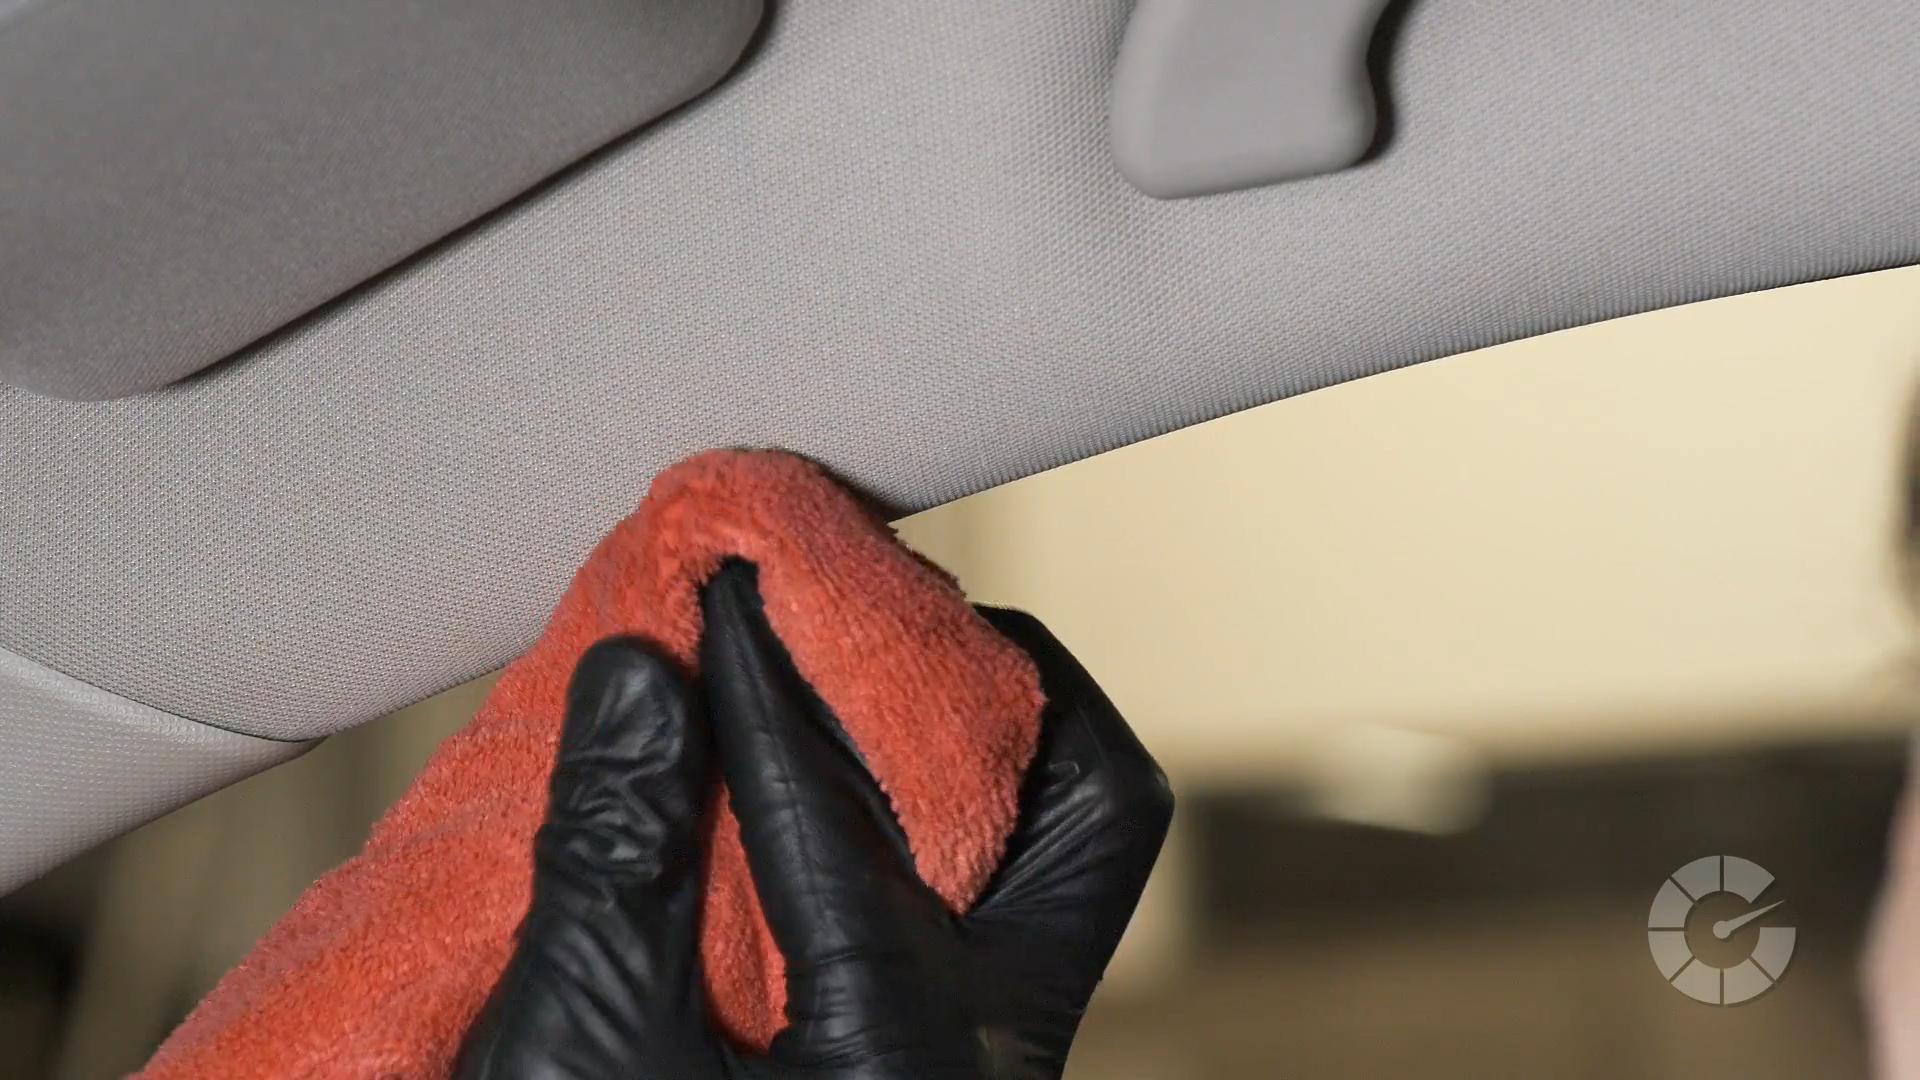 Car interior roof repair - Car Interior Roof Repair 72